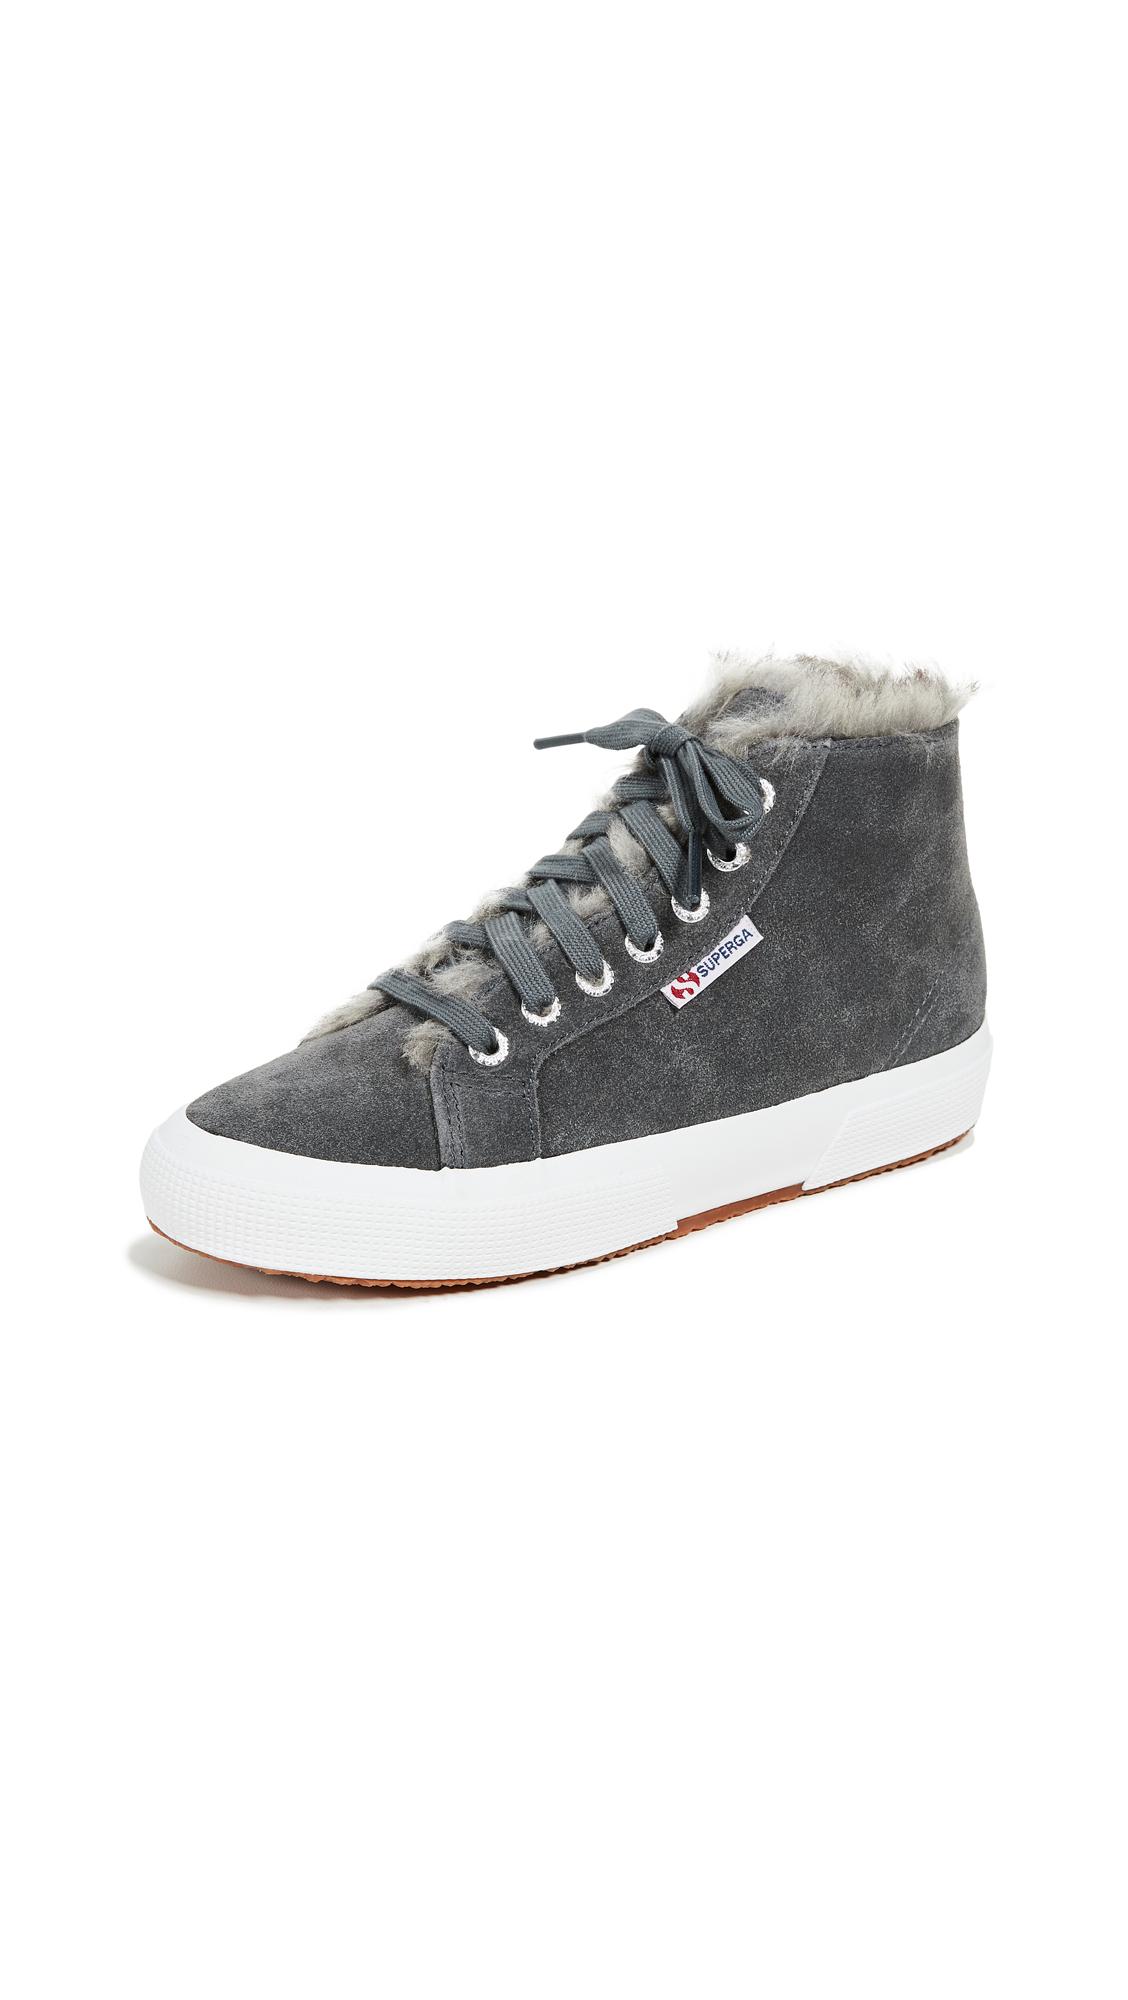 Superga 2795 Faux Fur Lined Sneakers In Dark Grey